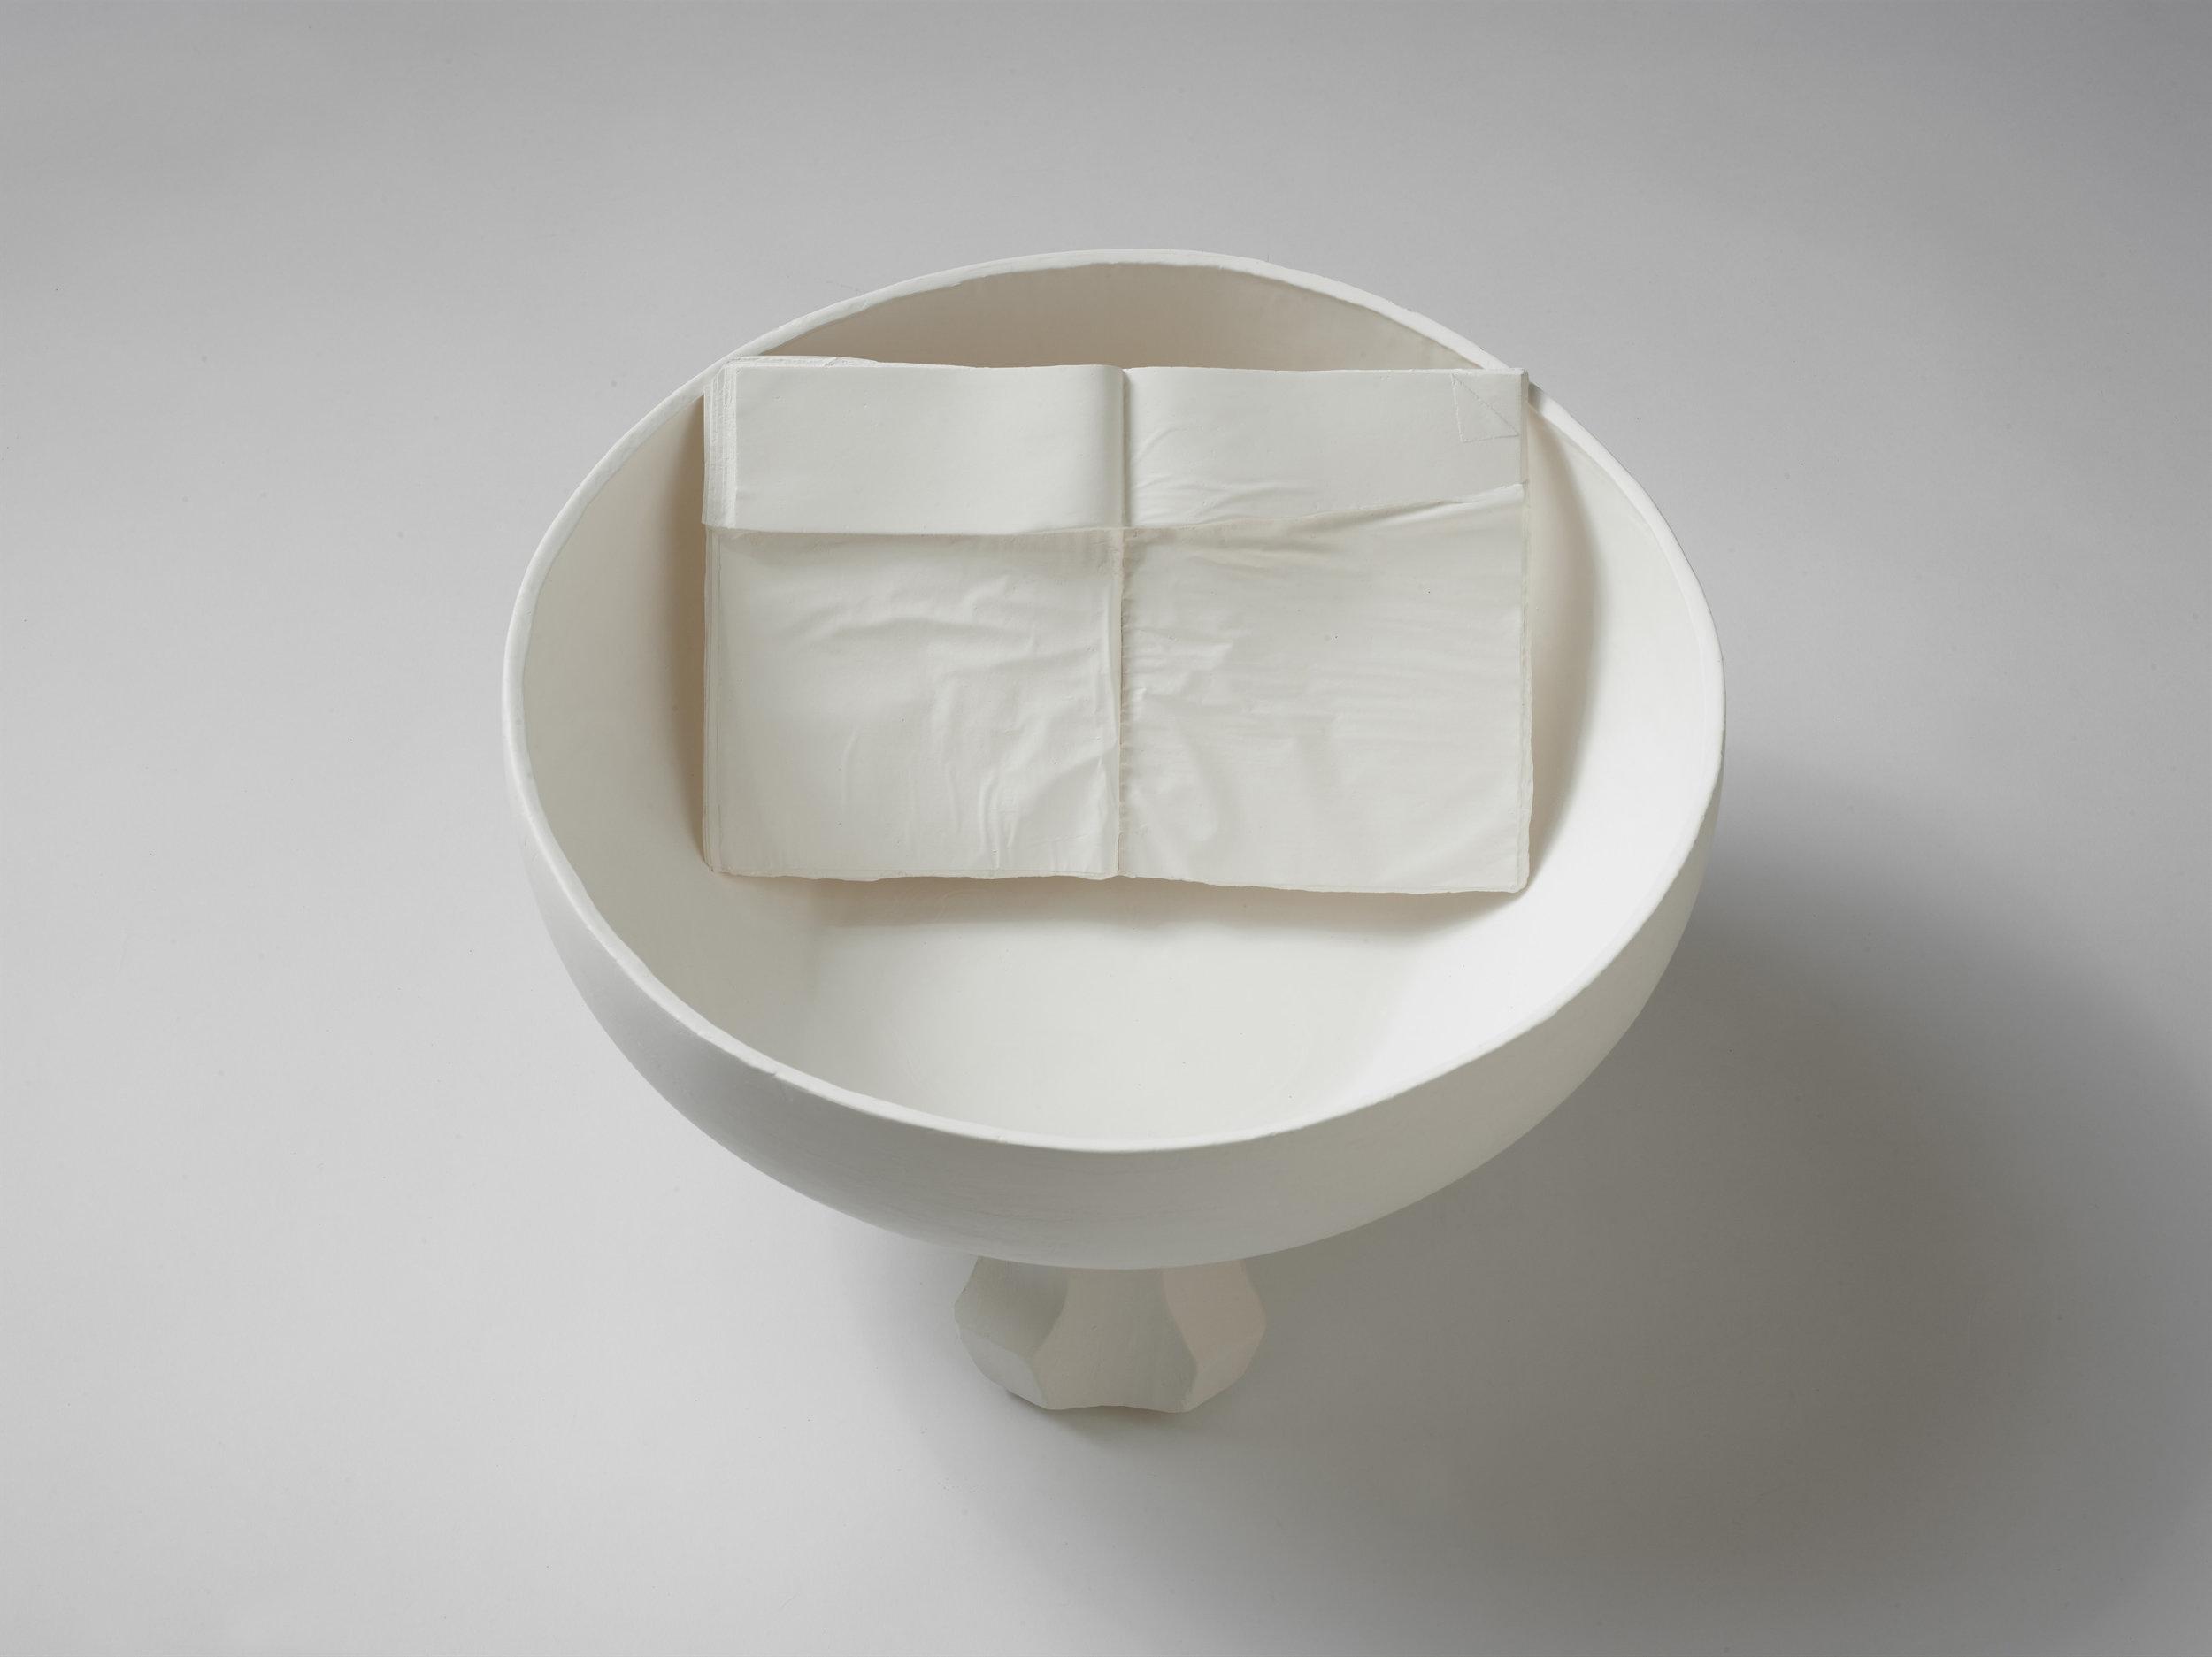 Bathtub,  2019, cast stoneware, wax, 18.5x18.5x10 inches